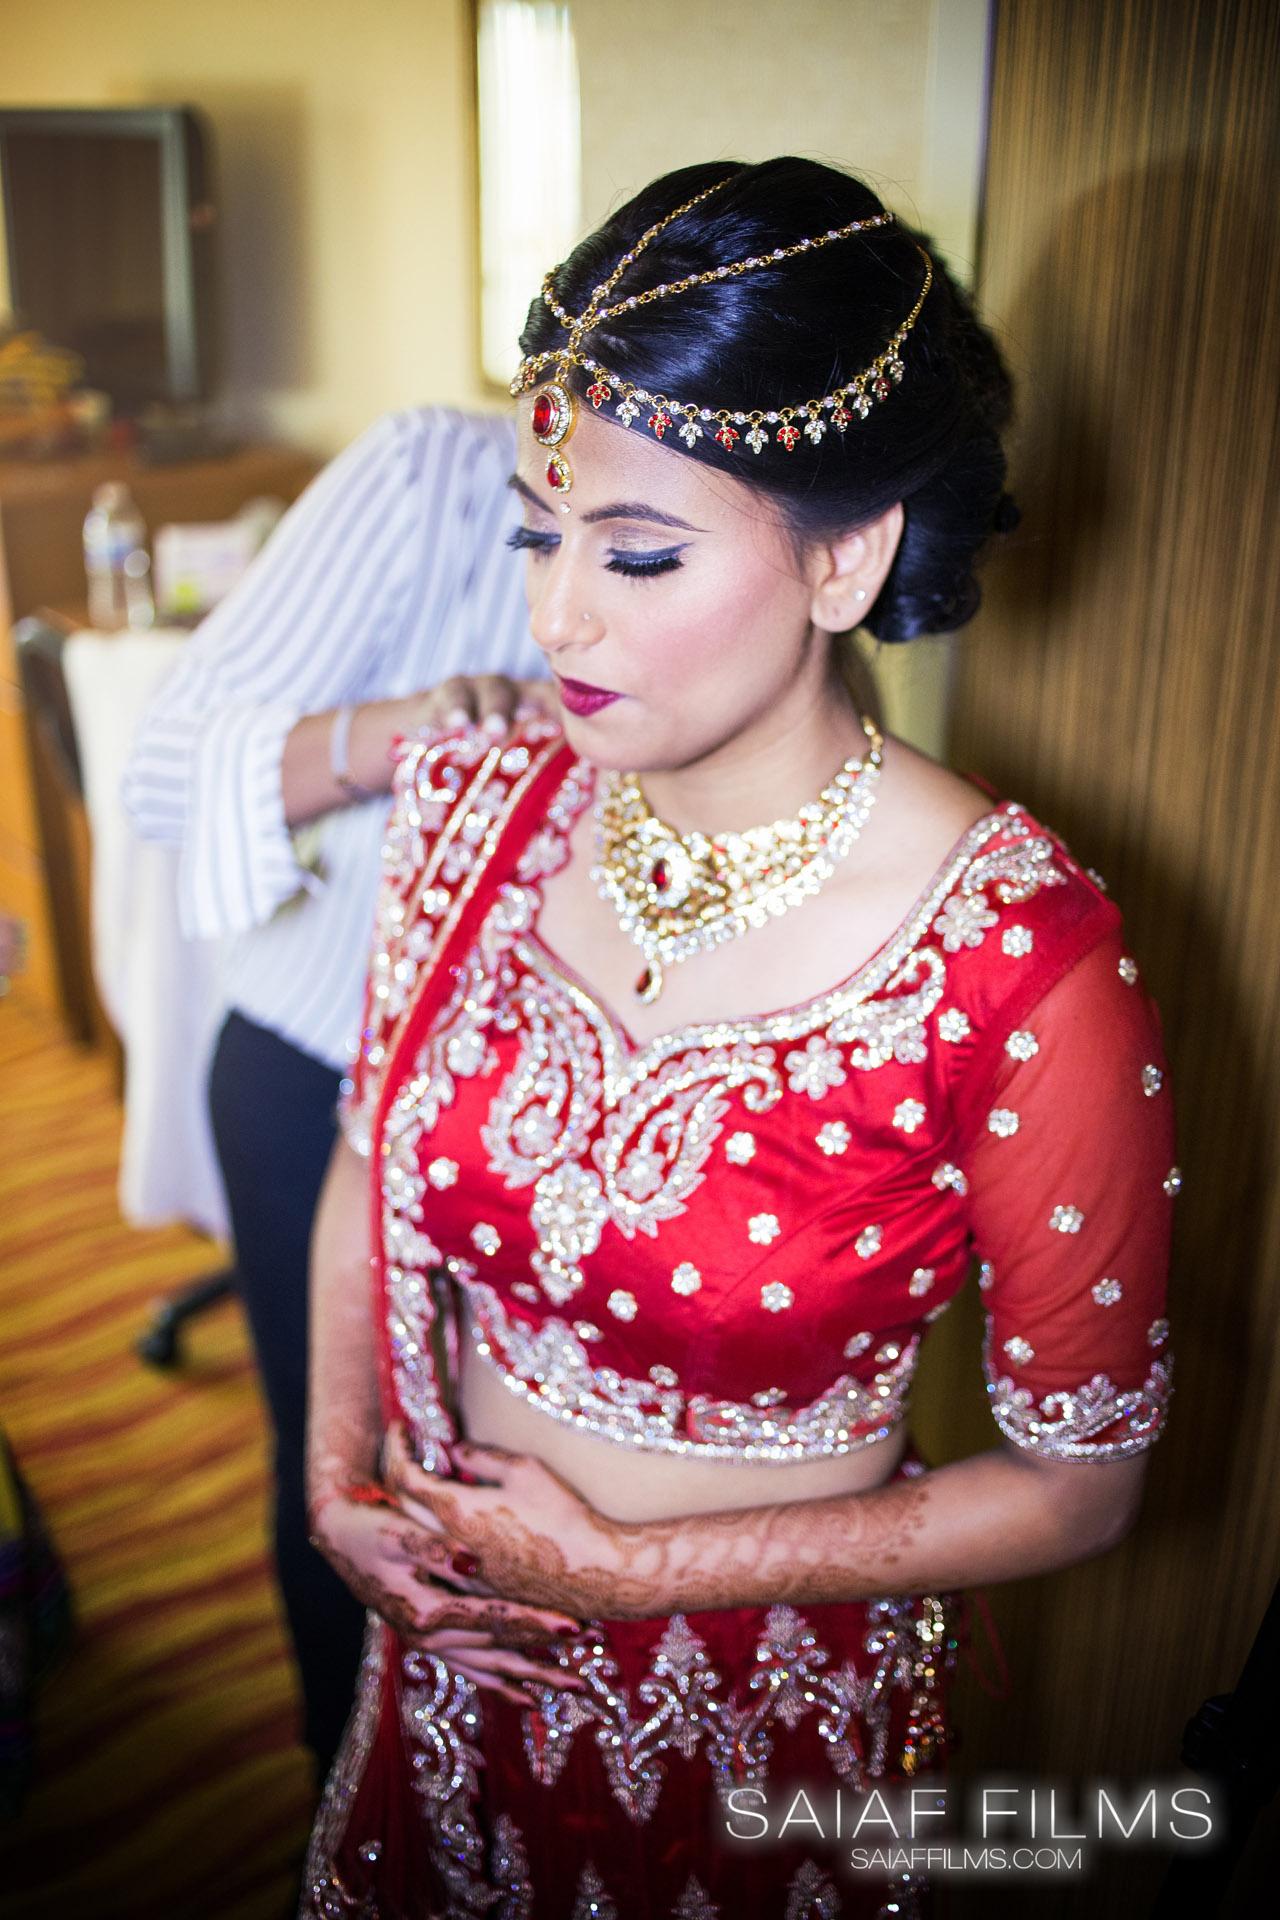 South Asian Films 104